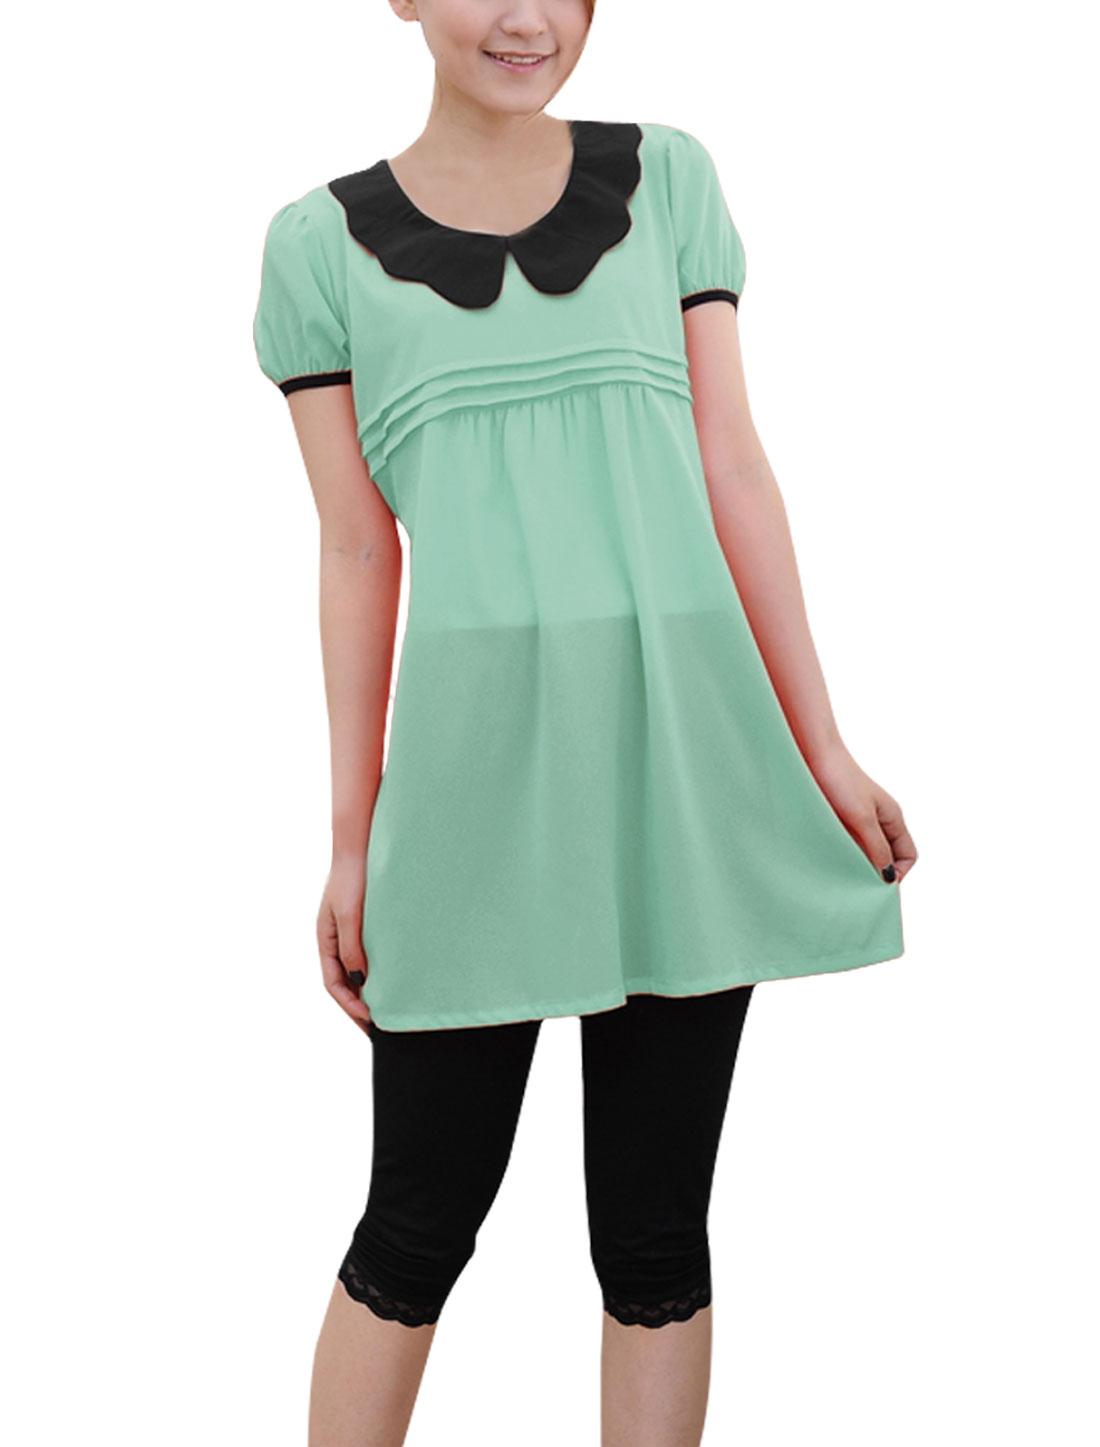 Pregnant Women Summer Wearing Short-sleeved Fashion Shirt Light Green L